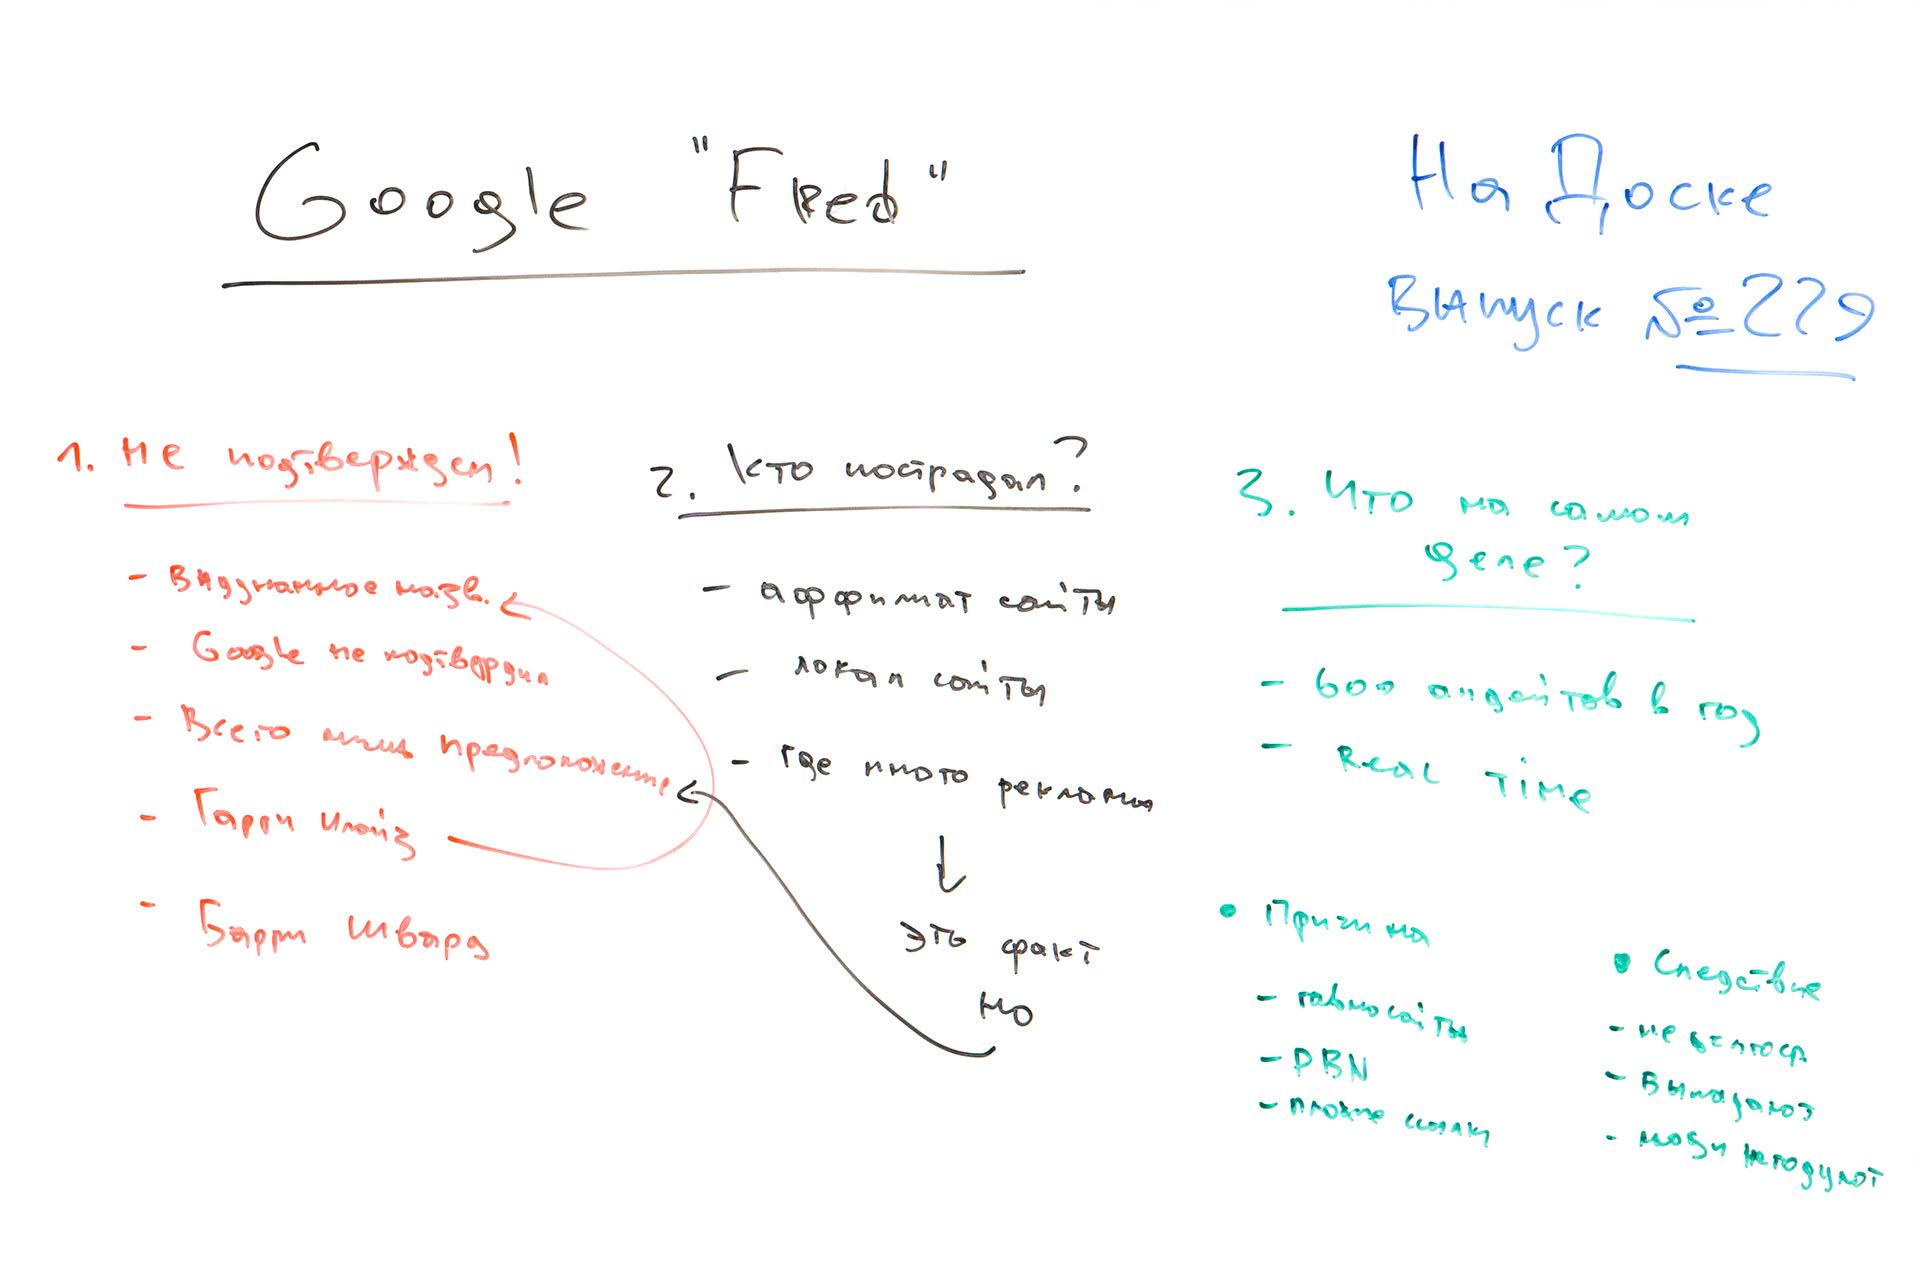 Google Fred - алгоритм или апдейт - На Доске – выпуск № 229